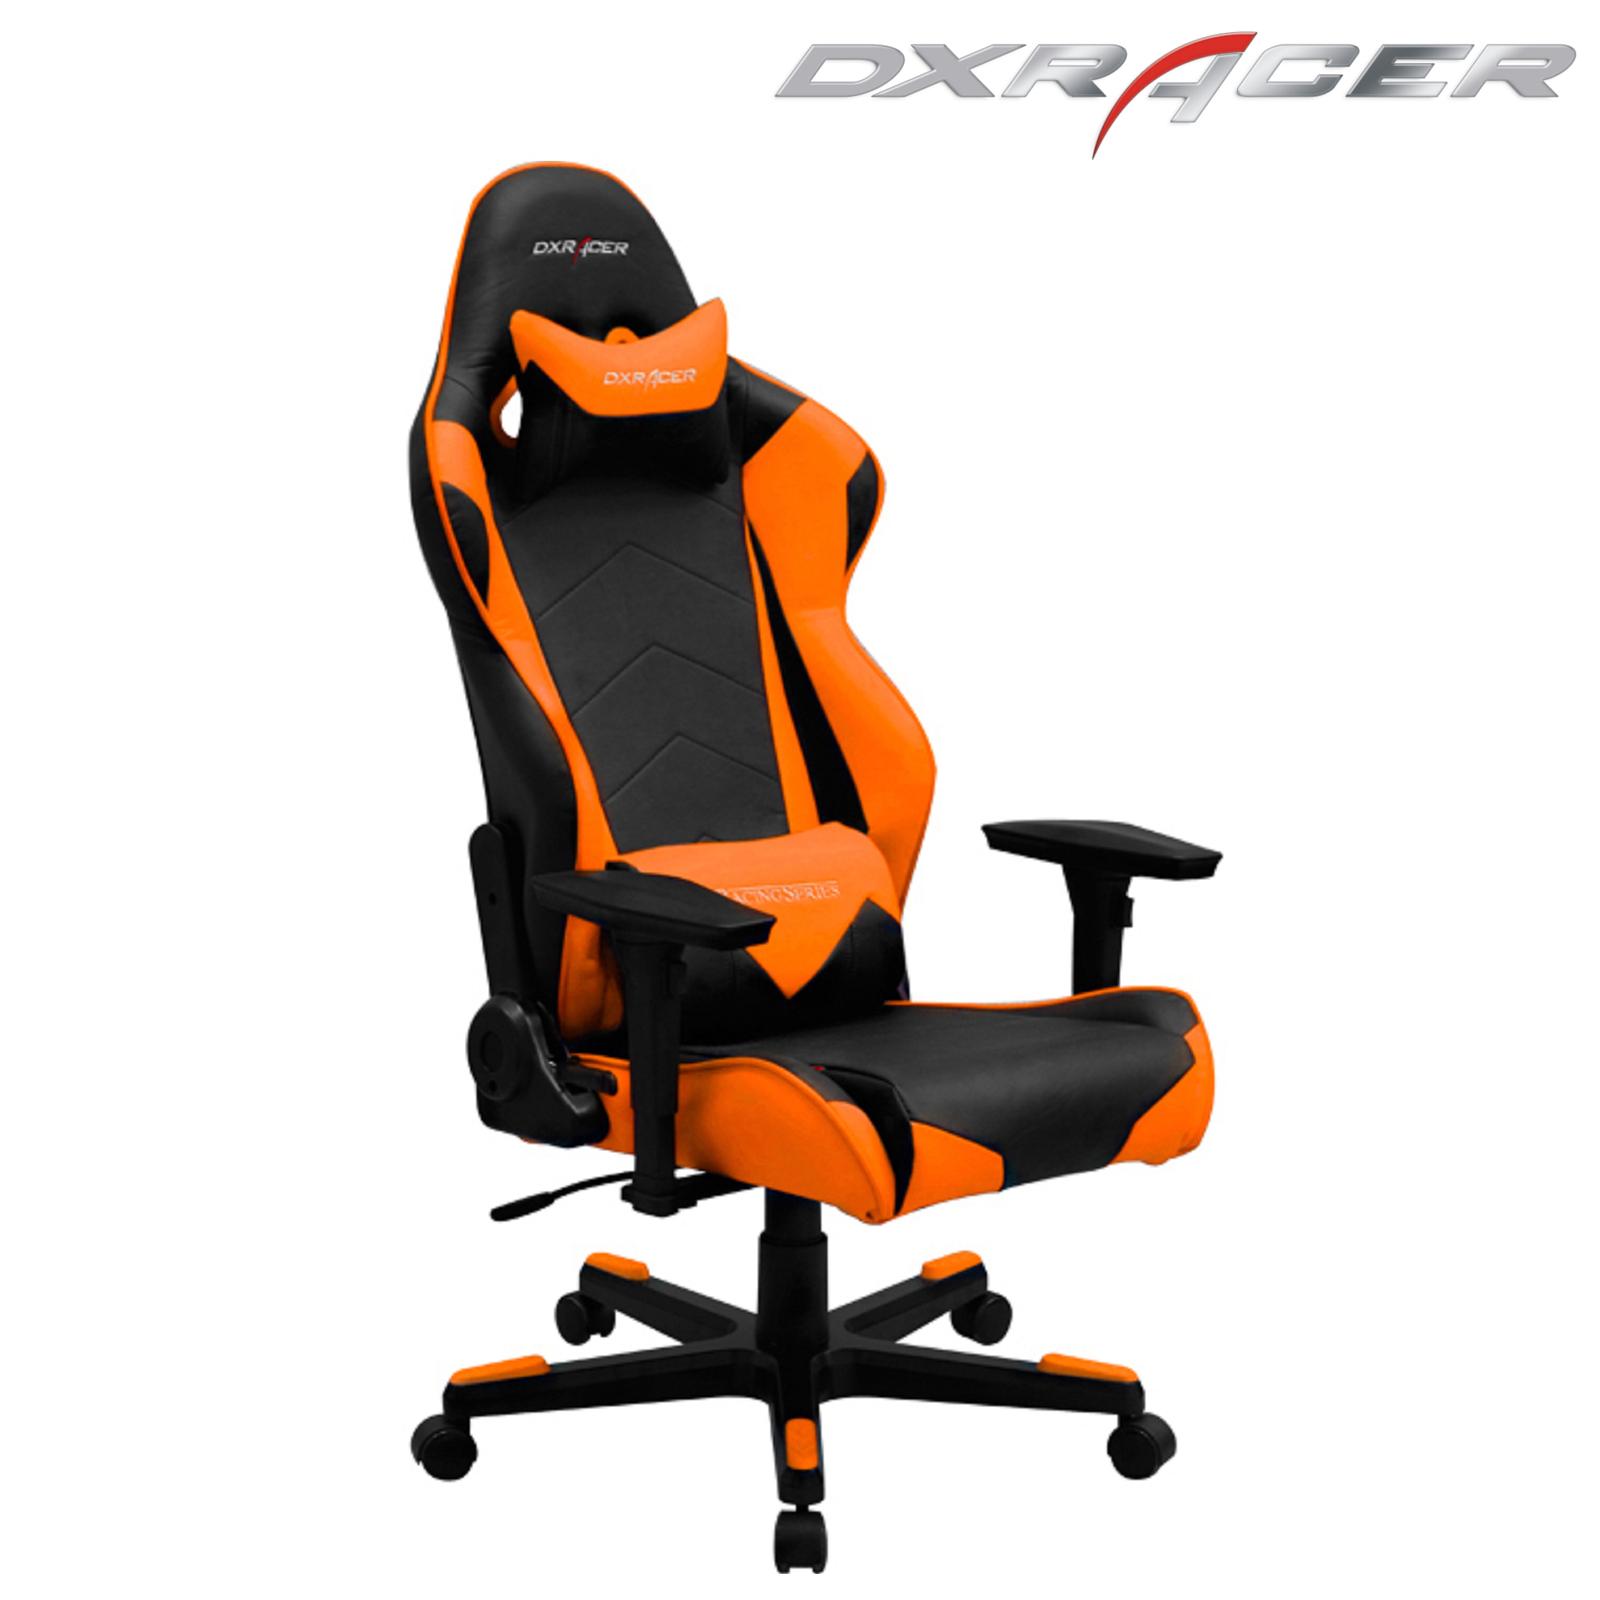 dxracer chair accessories fold up wheelchair rf0no desk sports racing office